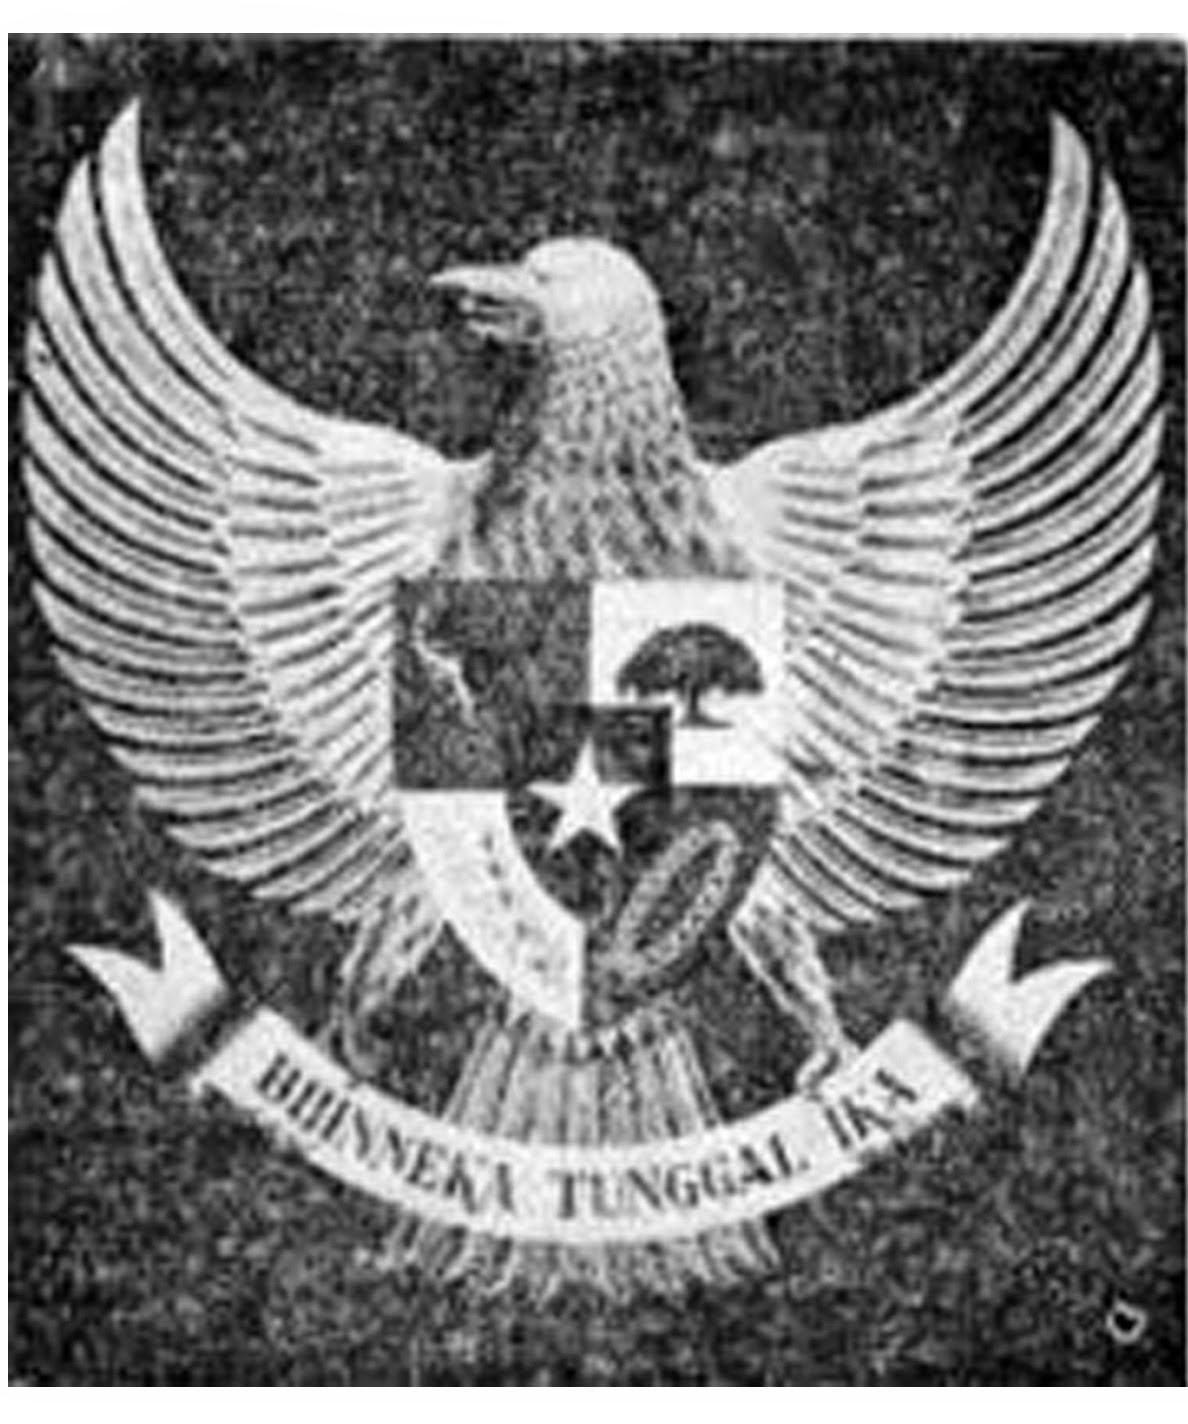 Lambang Setelah di revisi | sumber: sistempemerintahan-indonesia.blogspot.com